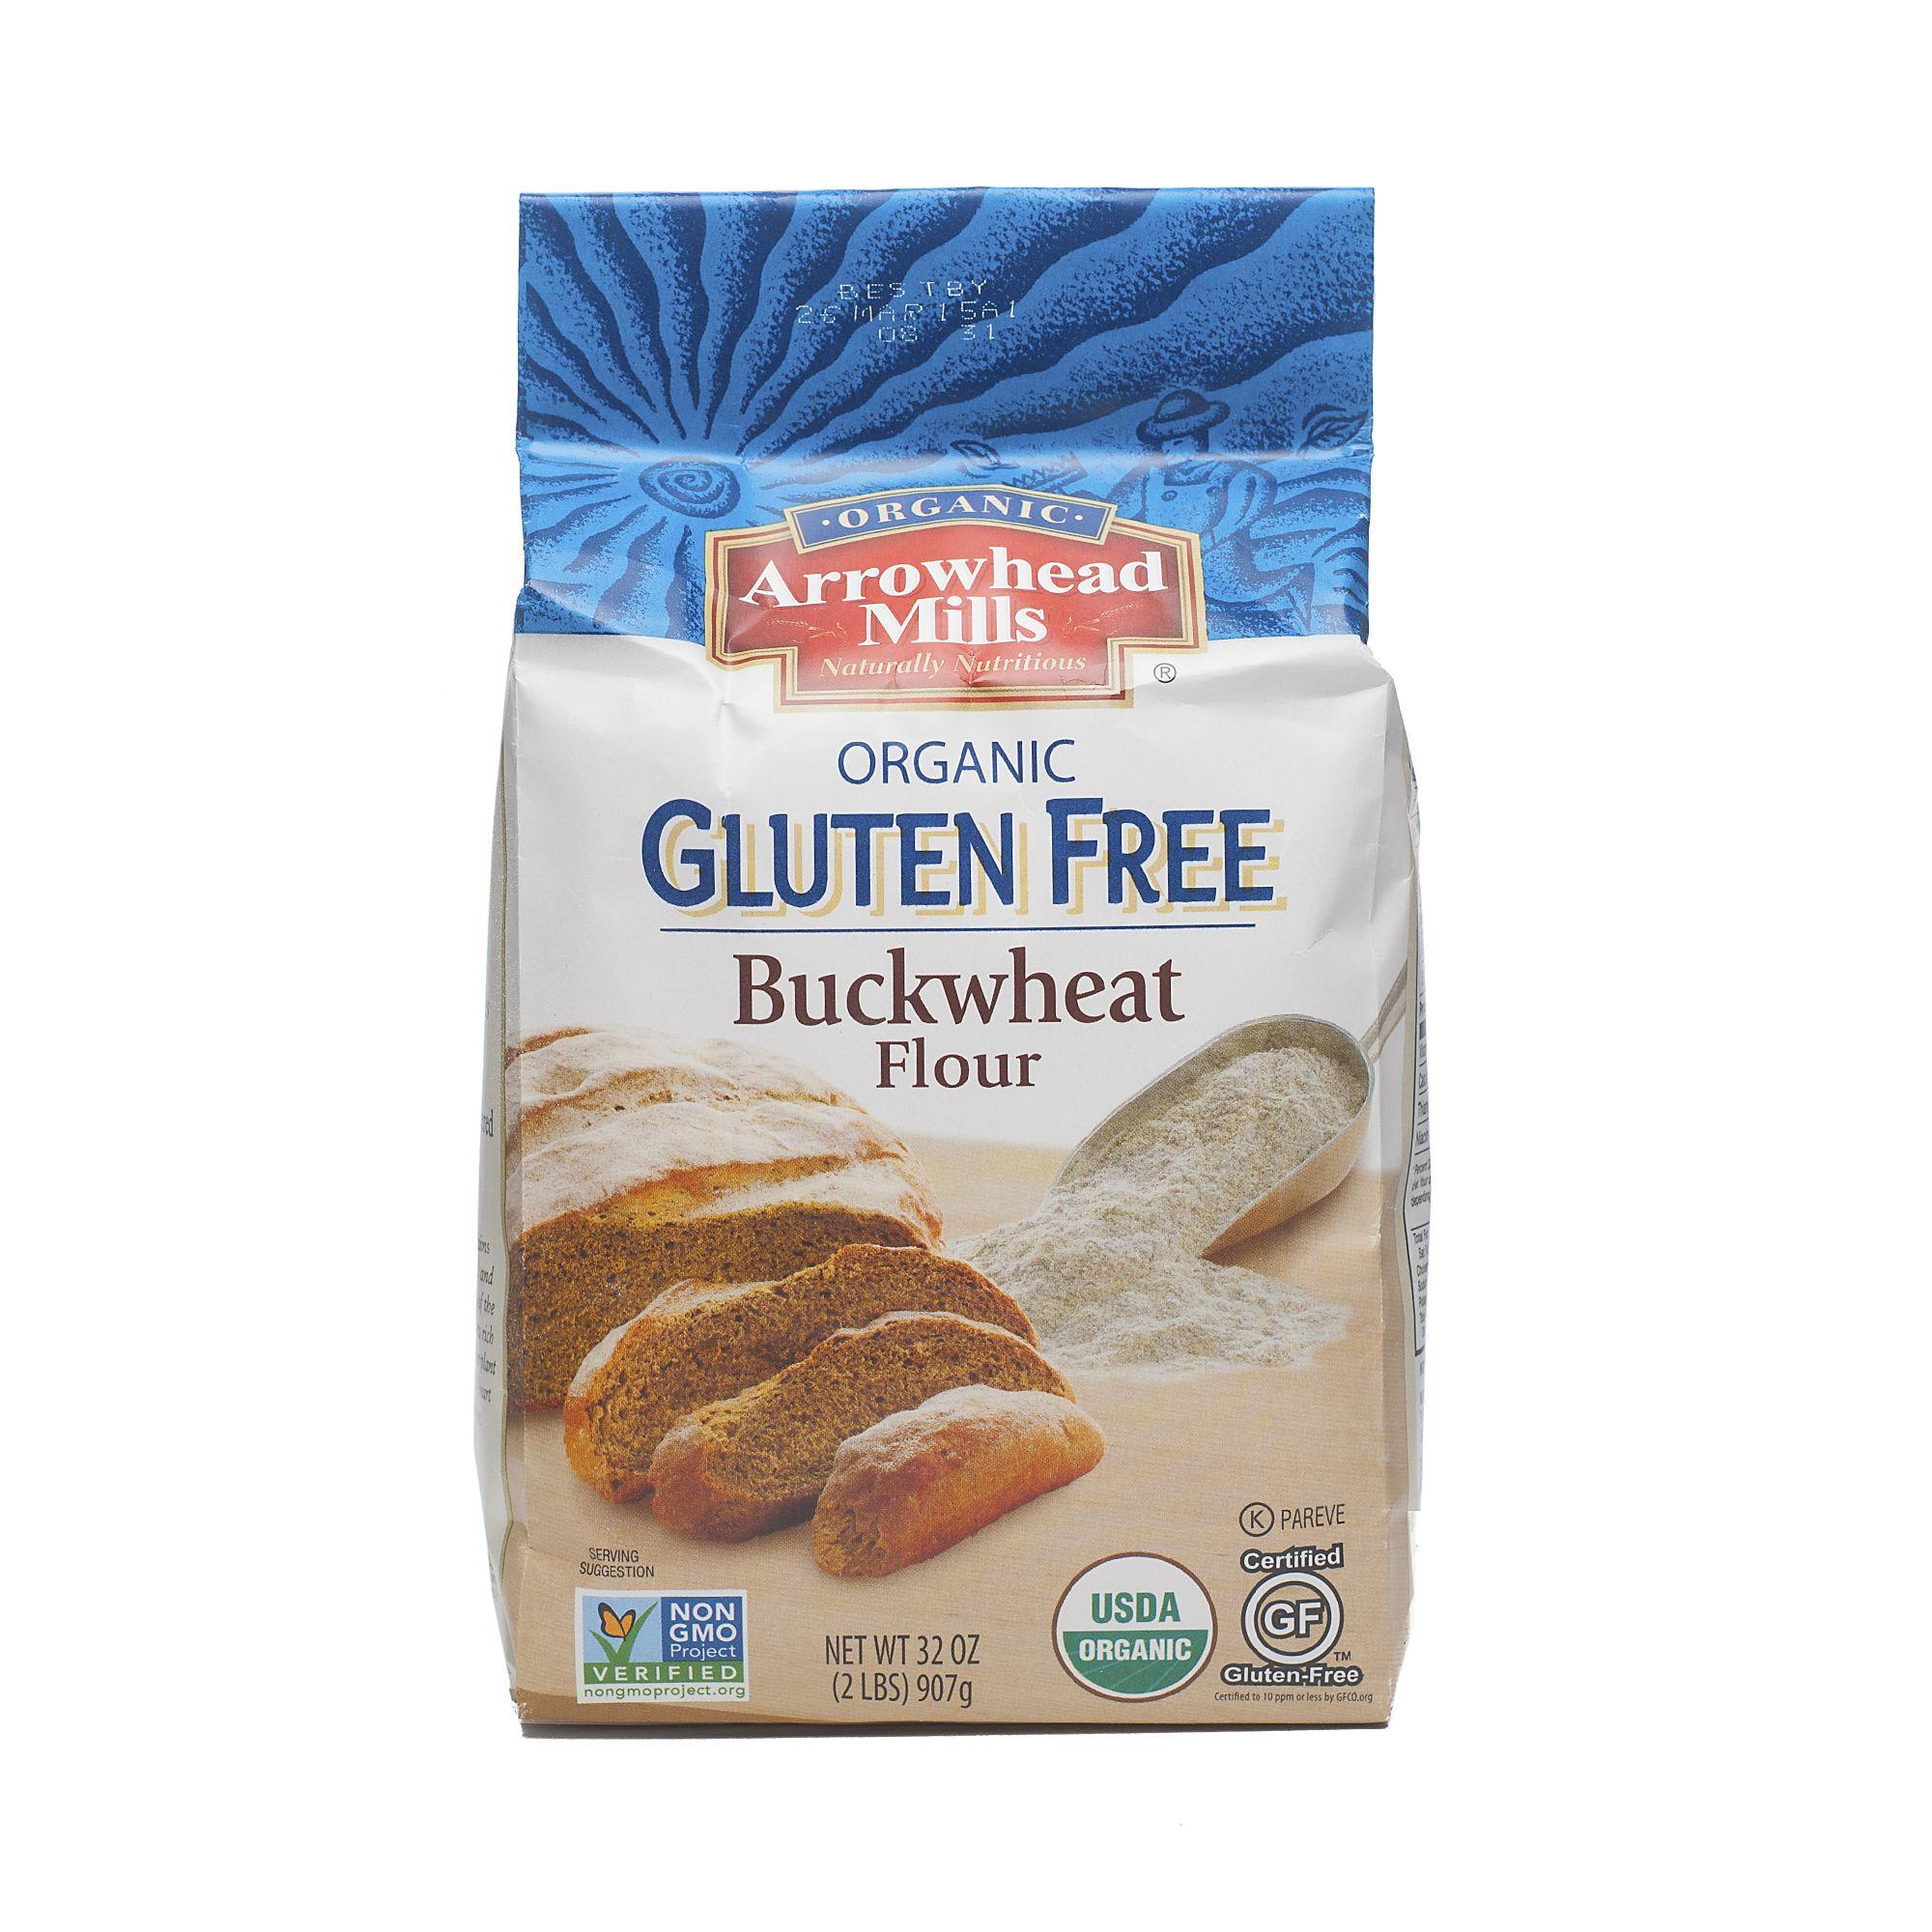 Arrowhead mills glutenfree organic buckwheat flour